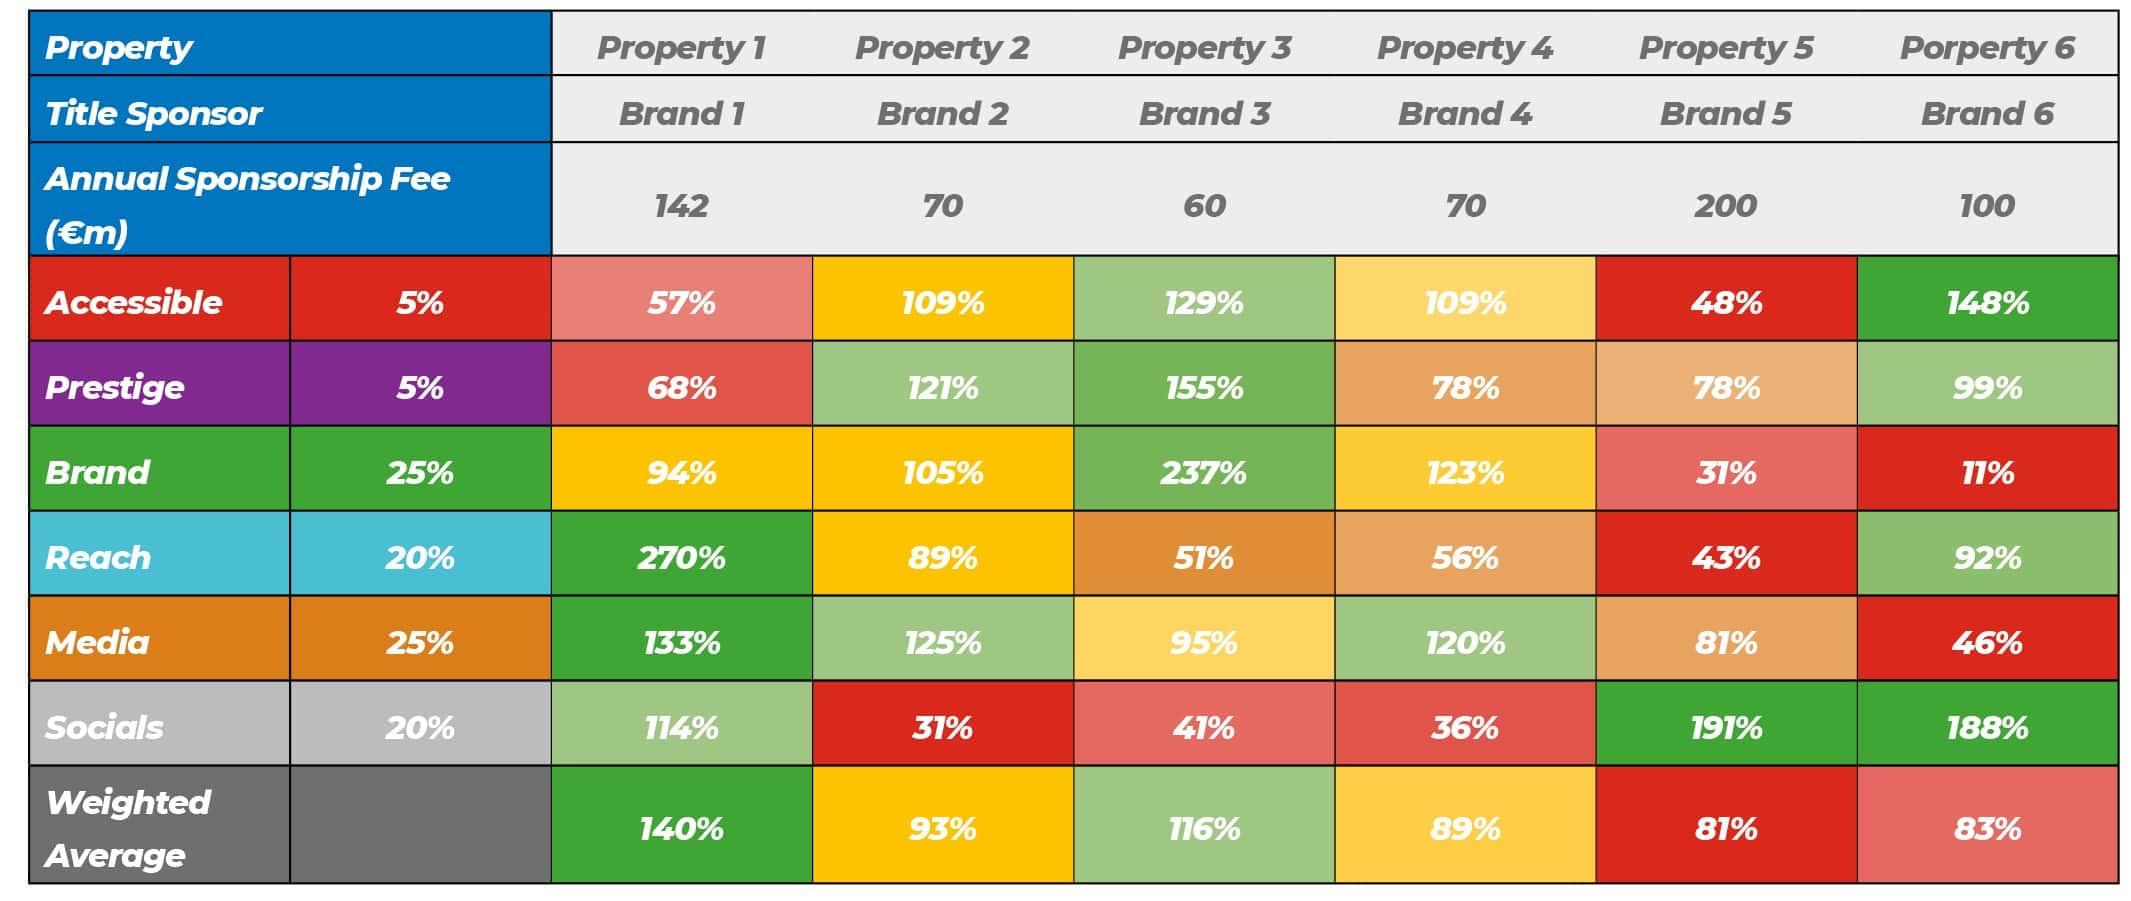 Market Comparison of Sponsorship Properties